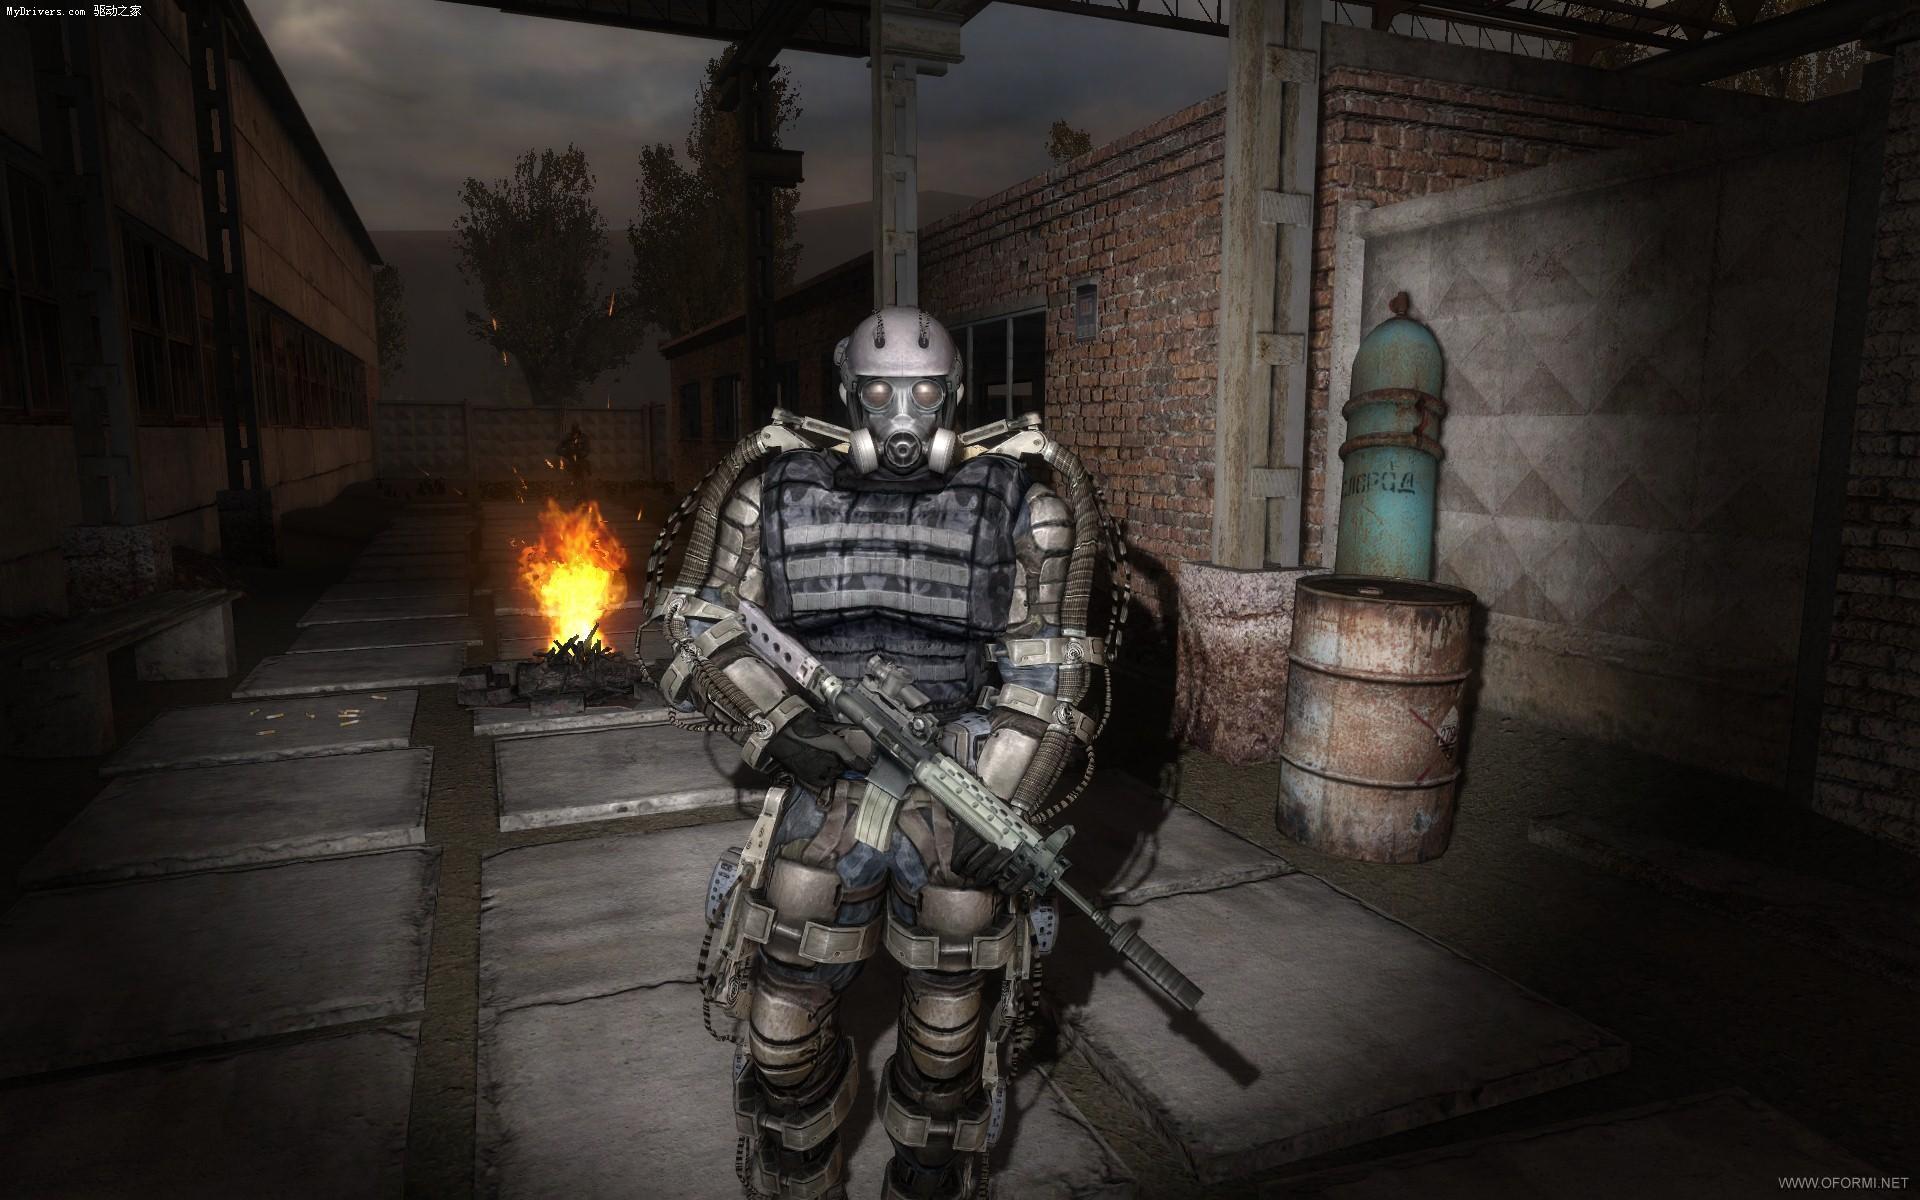 S.T.A.L.K.E.R. Зов Припяти - скриншоты DirectX 11.